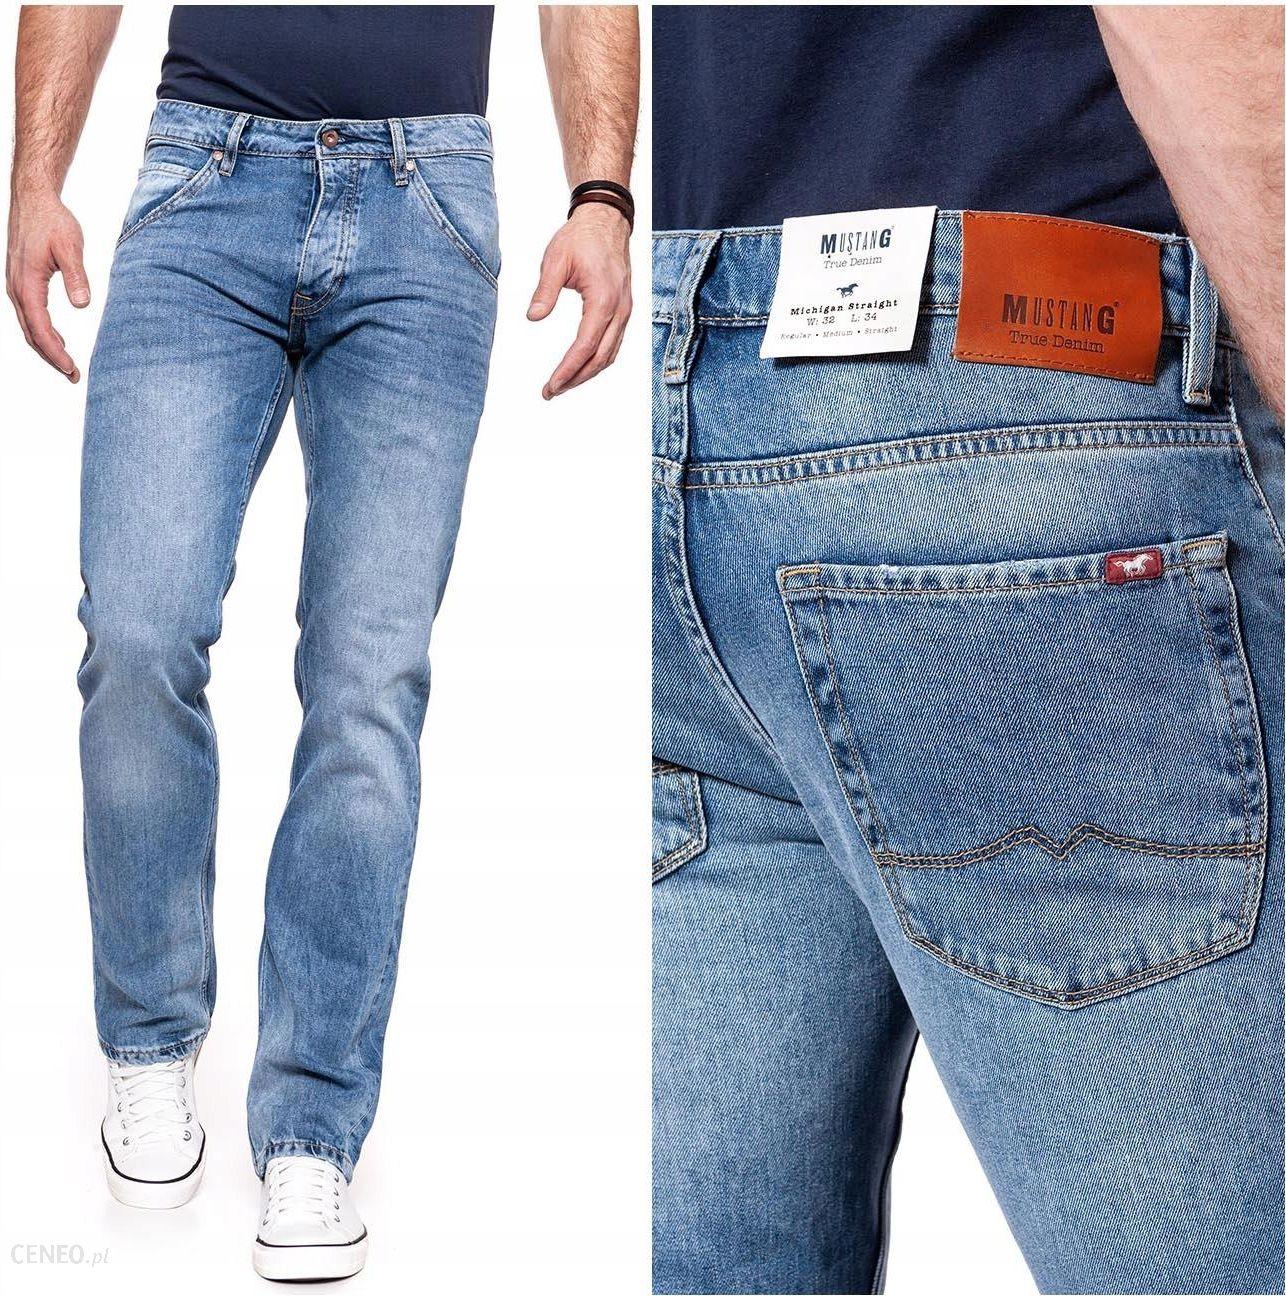 mustang michigan straight spodnie jeansowe w32 l32 ceny. Black Bedroom Furniture Sets. Home Design Ideas